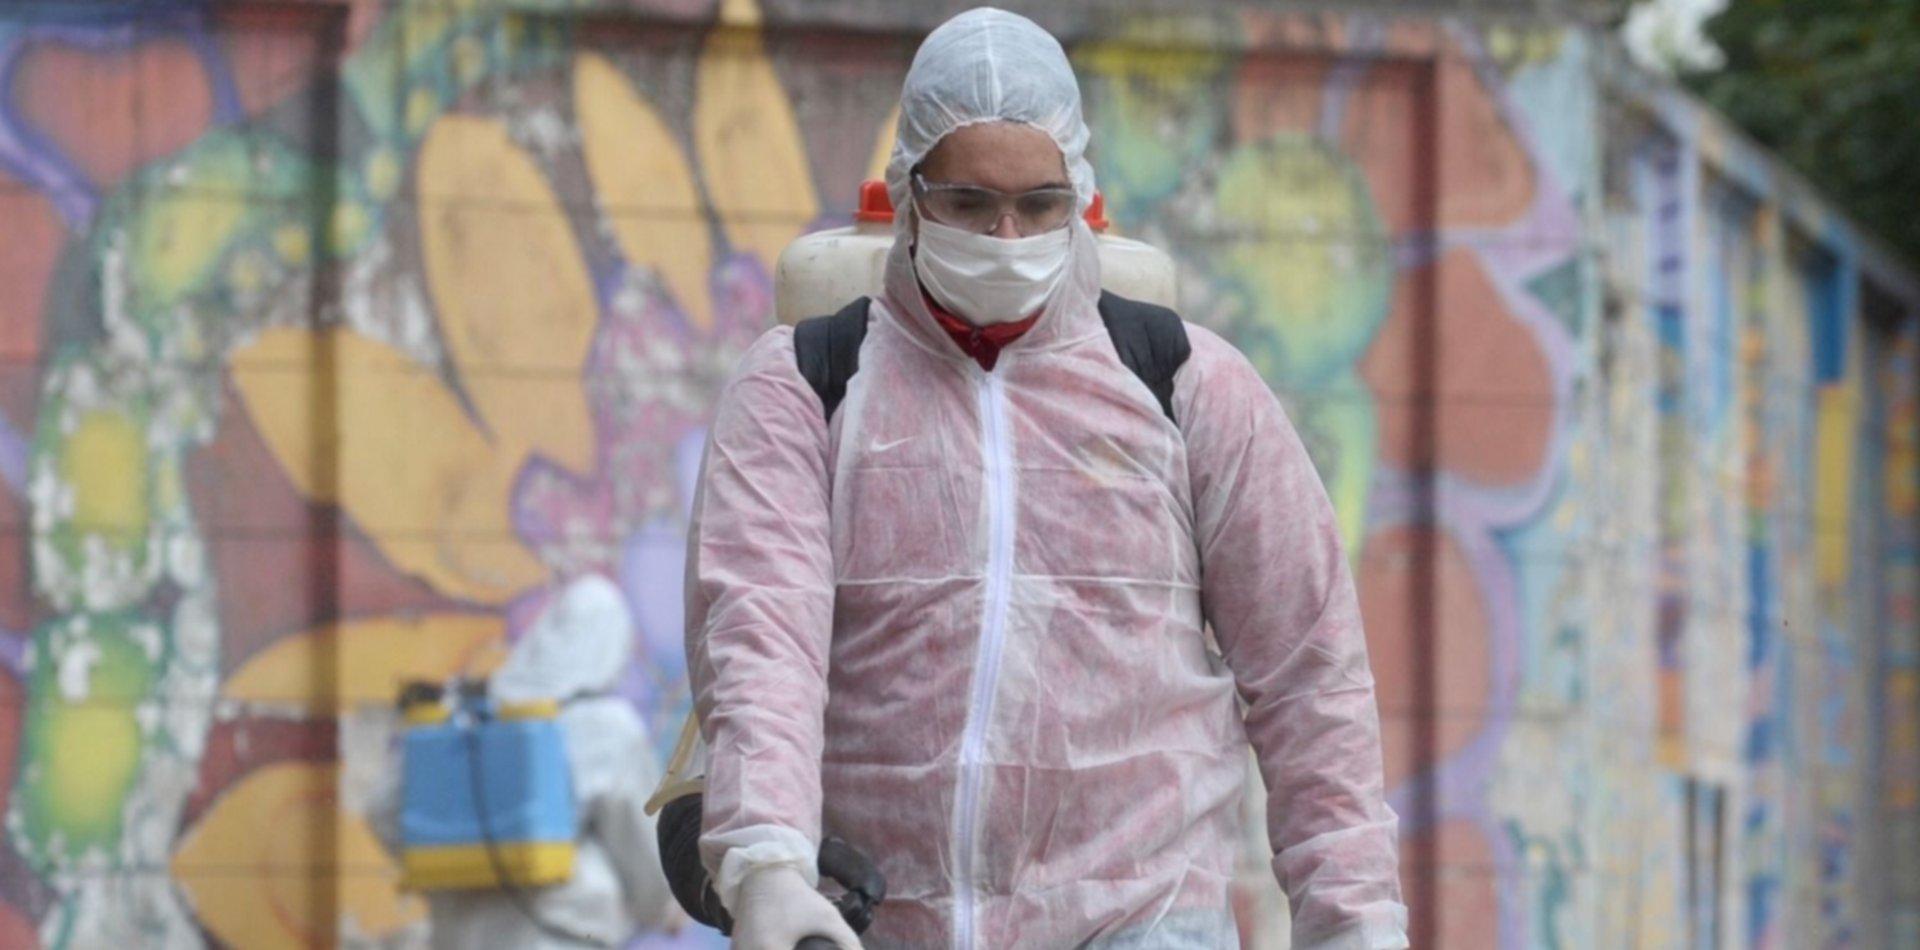 Montarán un operativo anti coronavirus en un barrio de La Plata